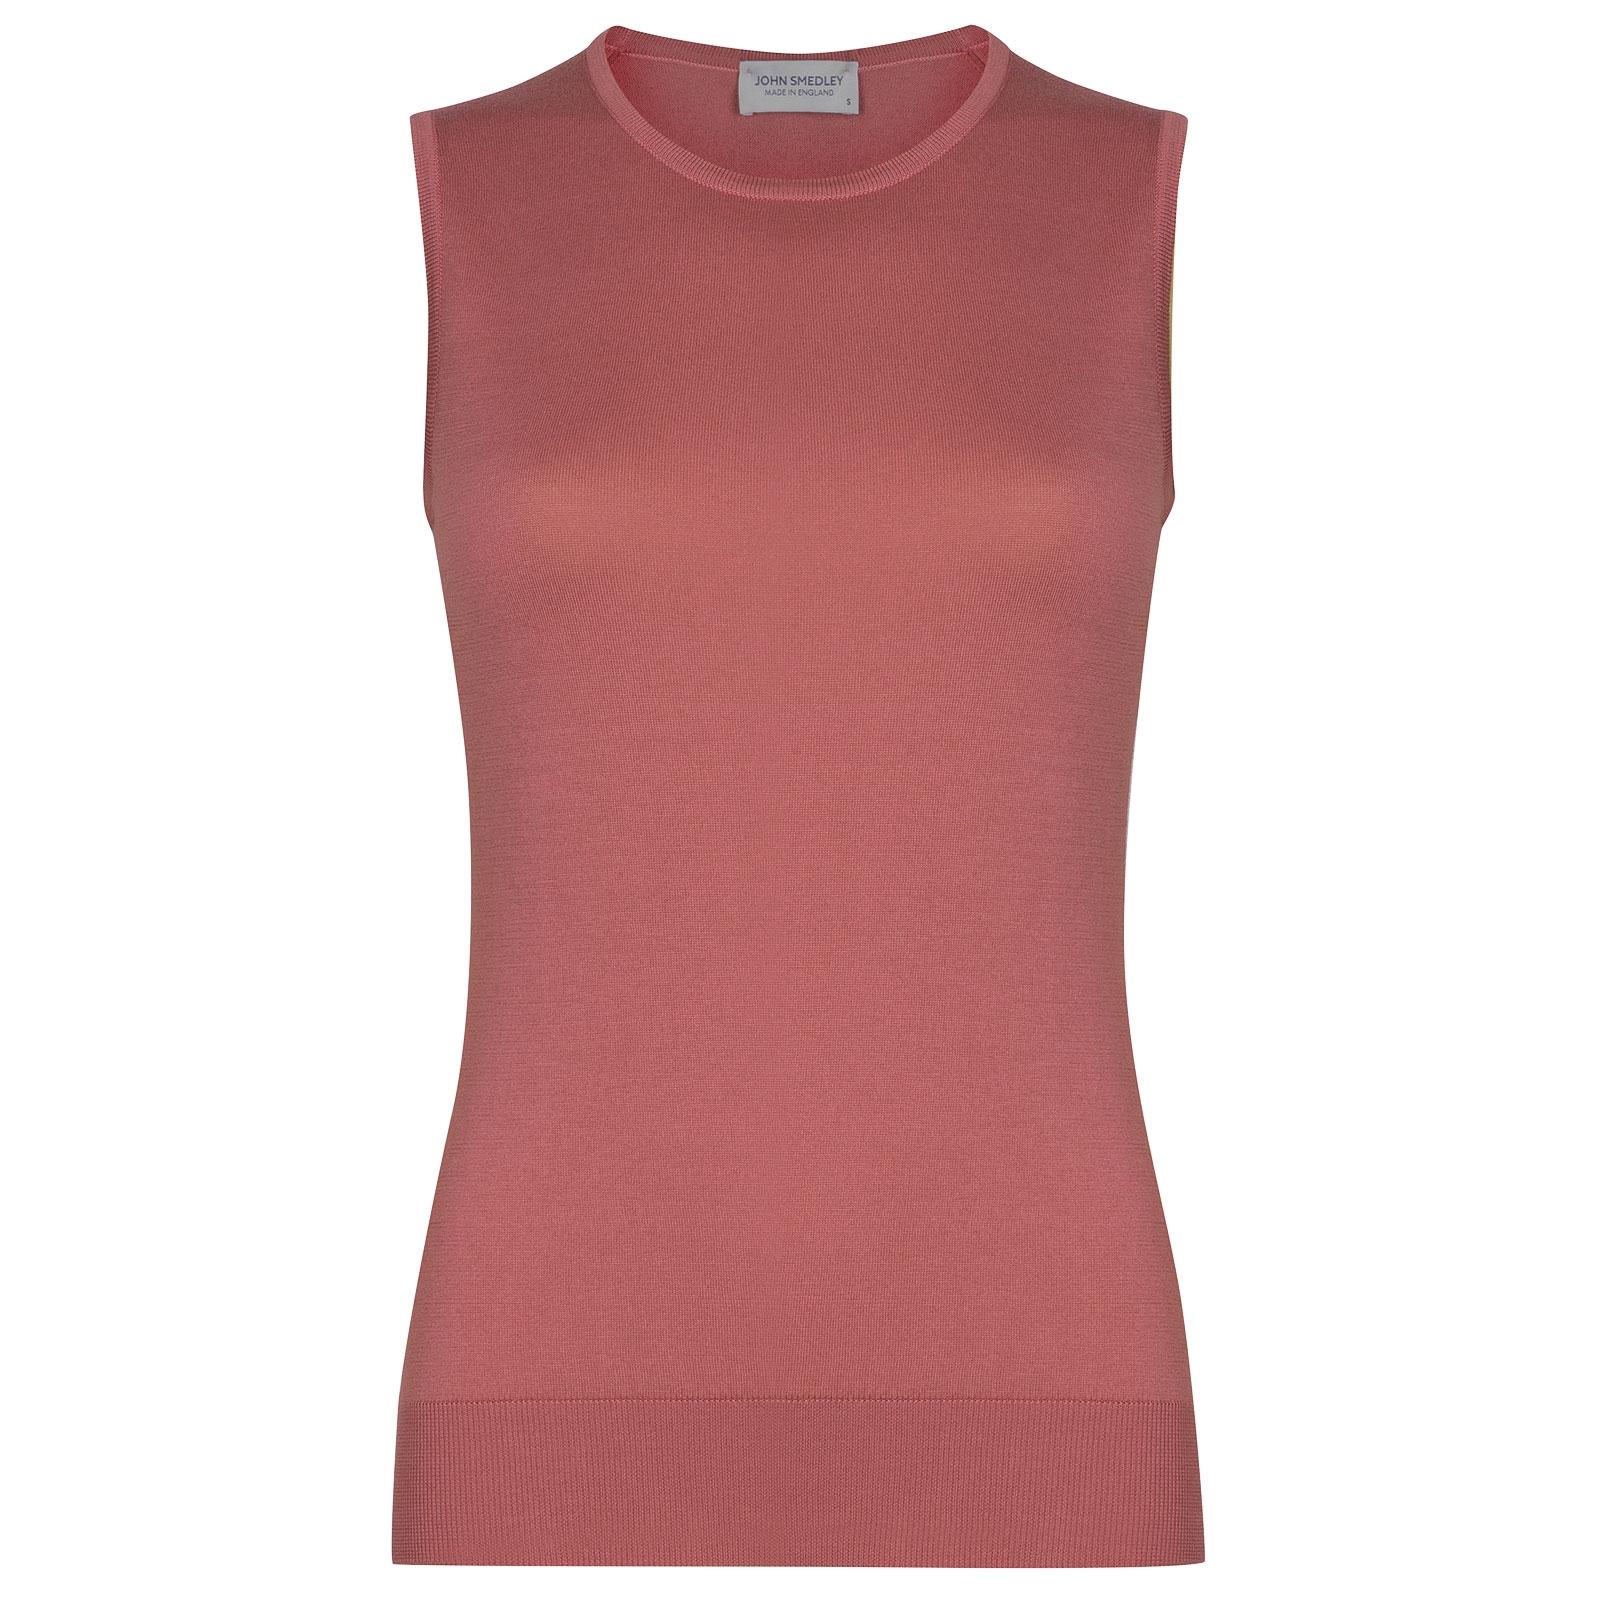 John Smedley Highgate in Azalea Pink Sweater-LGE